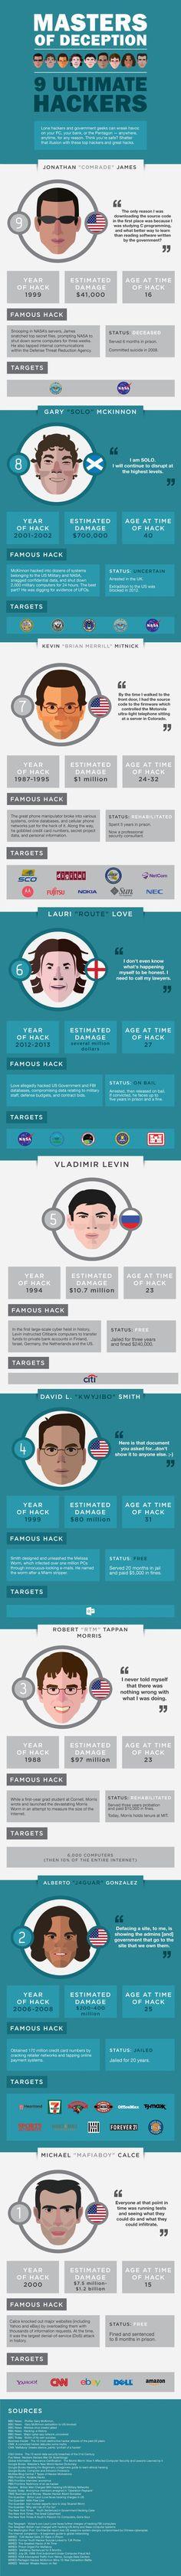 Hackers ultimes